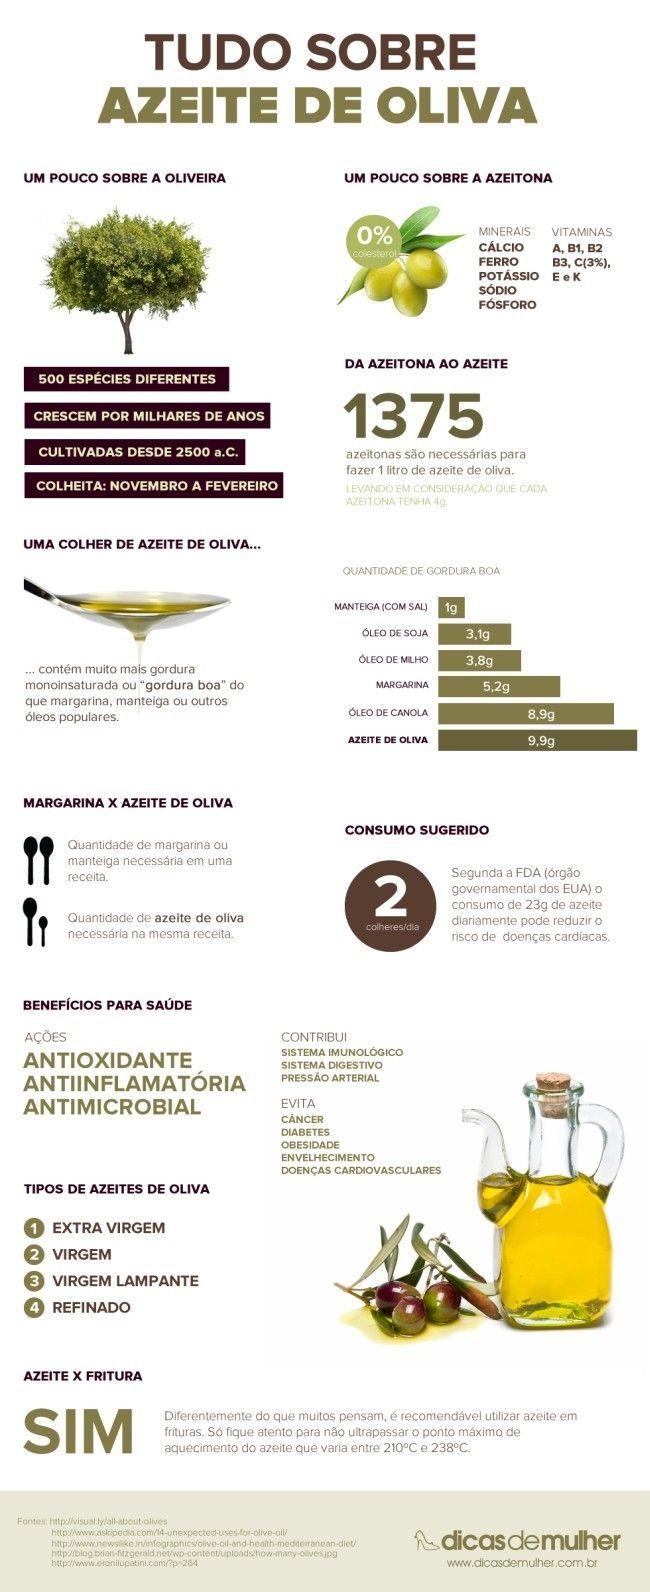 infografico-azeite-de-oliva